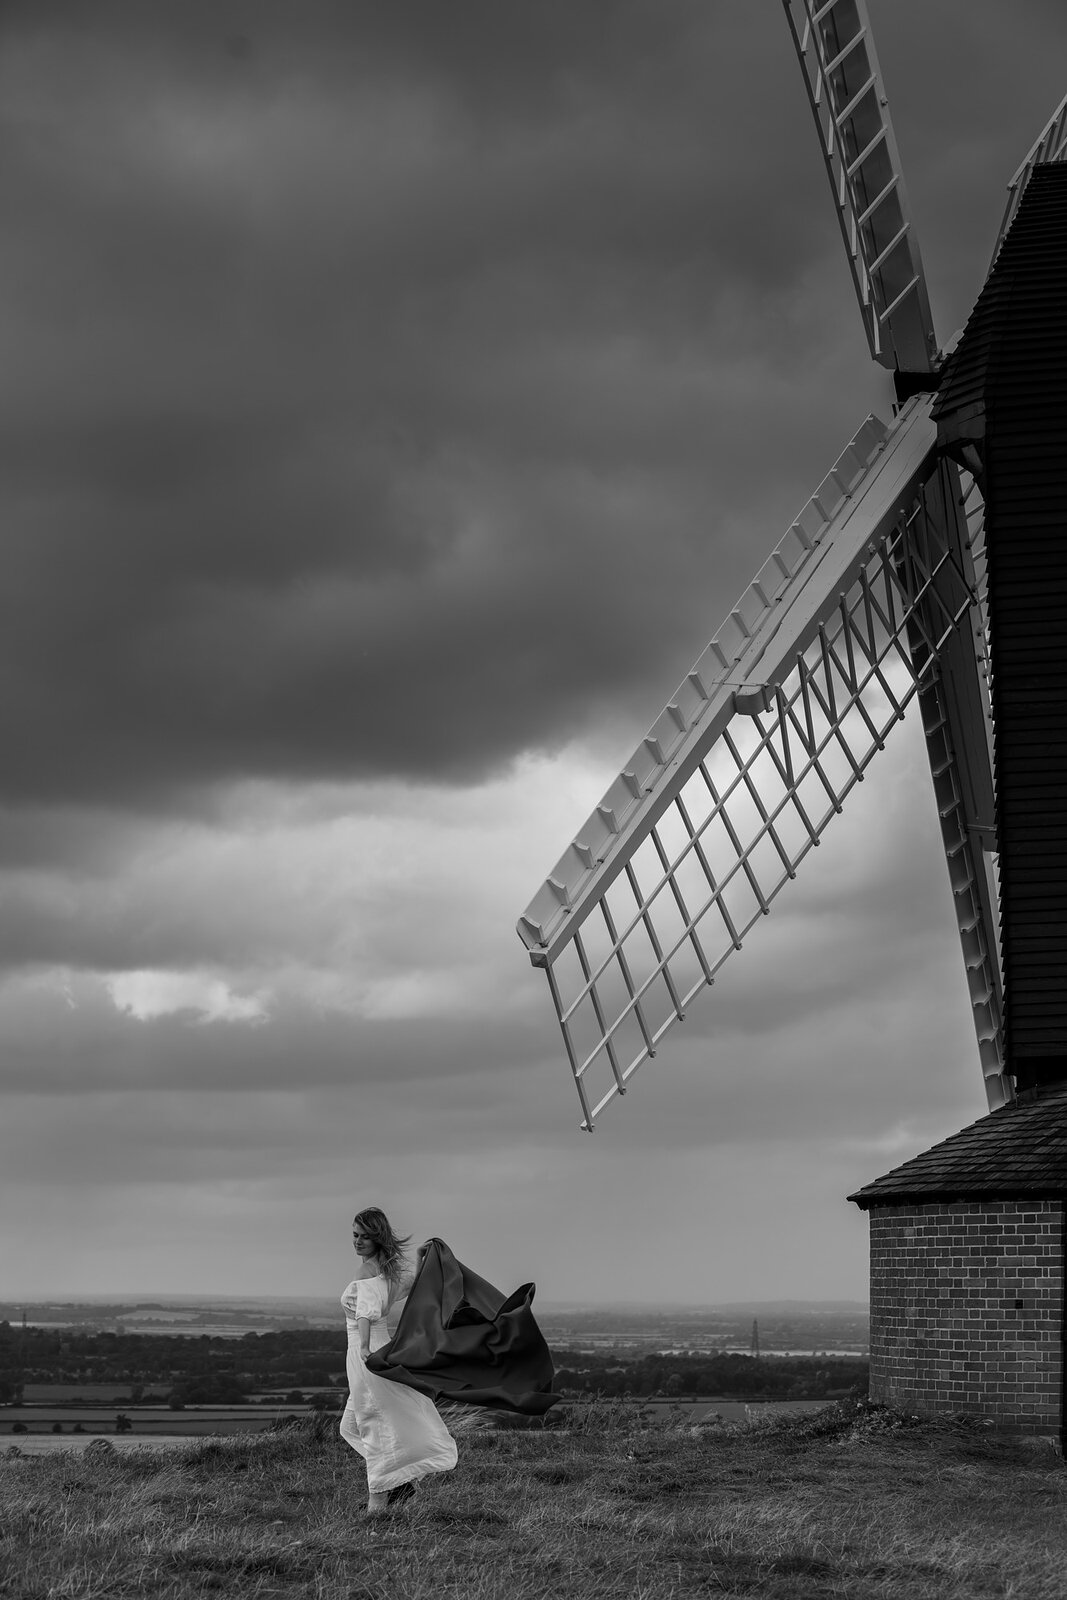 The Winds over Otmoor